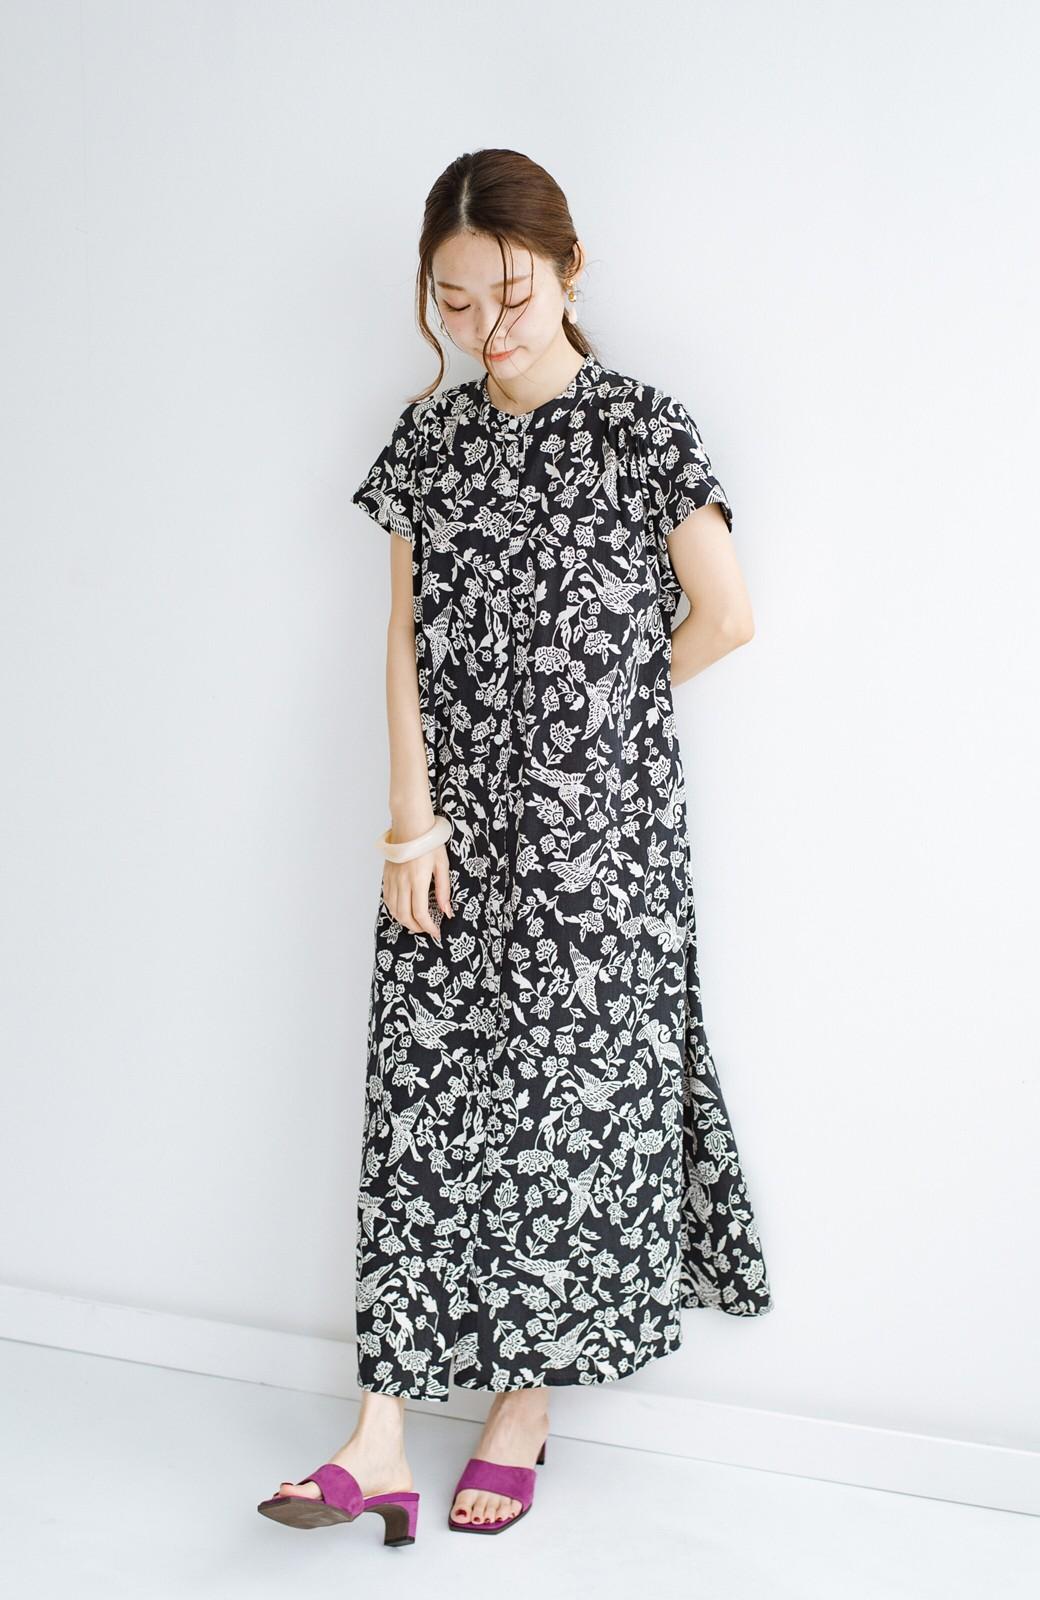 haco! 京都の浴衣屋さんと作った浴衣生地の羽織ってもかわいいロングワンピース <ブラック系その他>の商品写真12